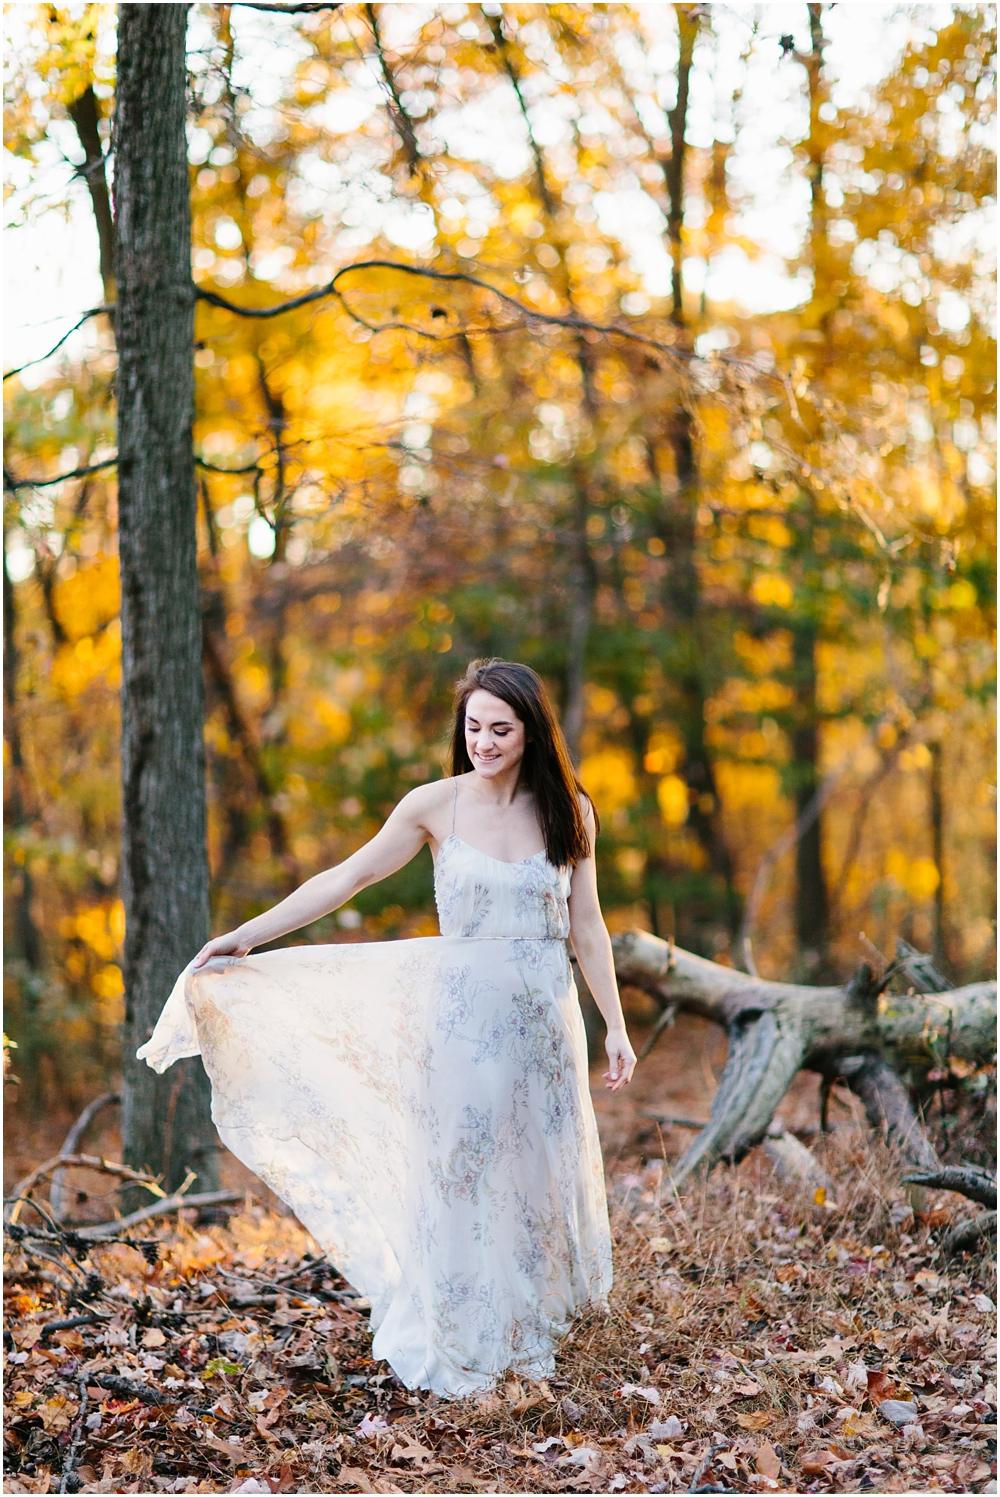 allison_eric_rocks_state_park_engagement_baltimore_wedding_photographer_0118